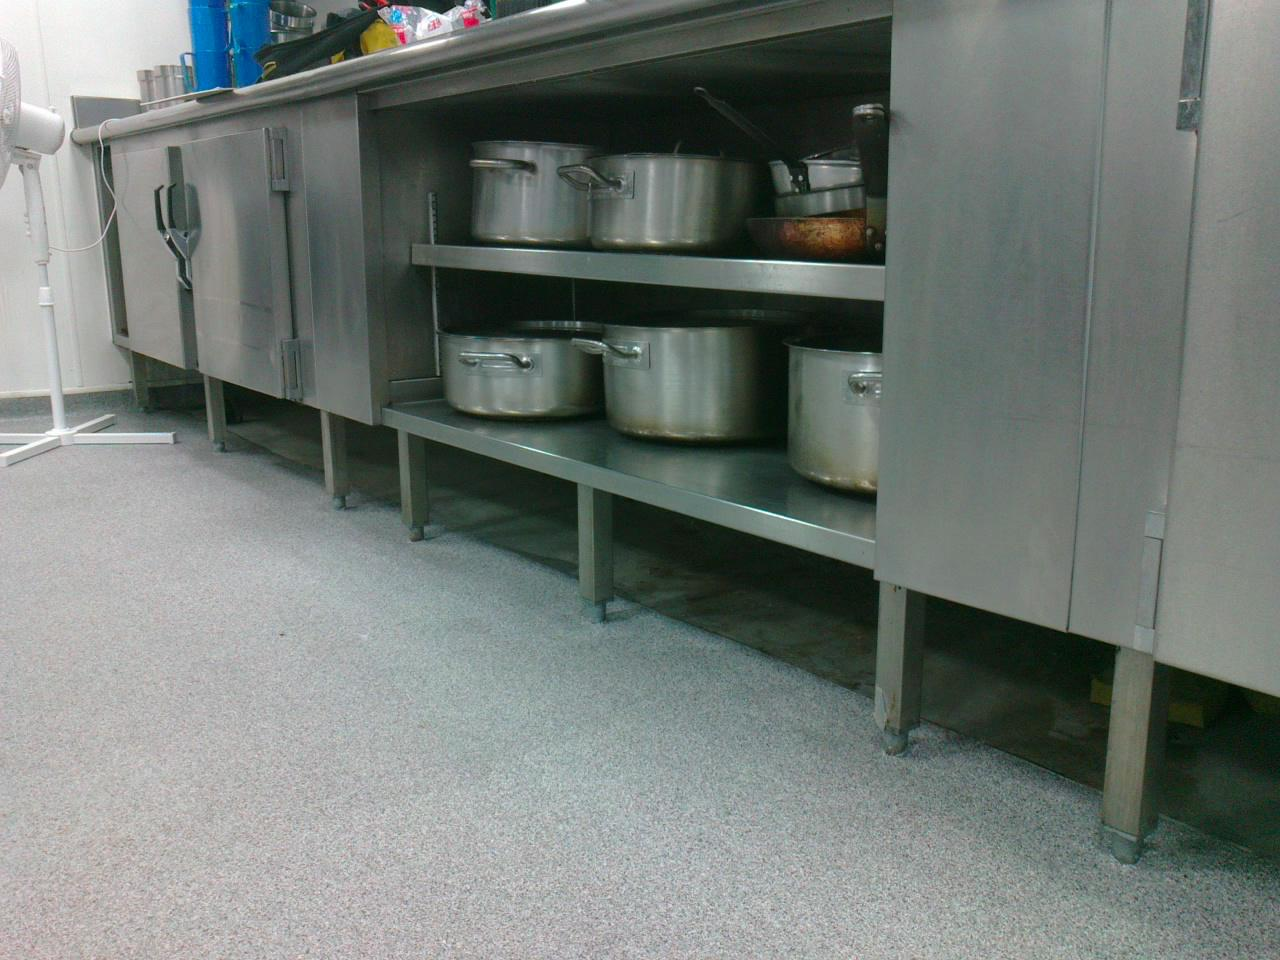 Stainless steel kitchen plinths for bancroft s school woodford green essex metal fabrication - Kitchen plinths ...